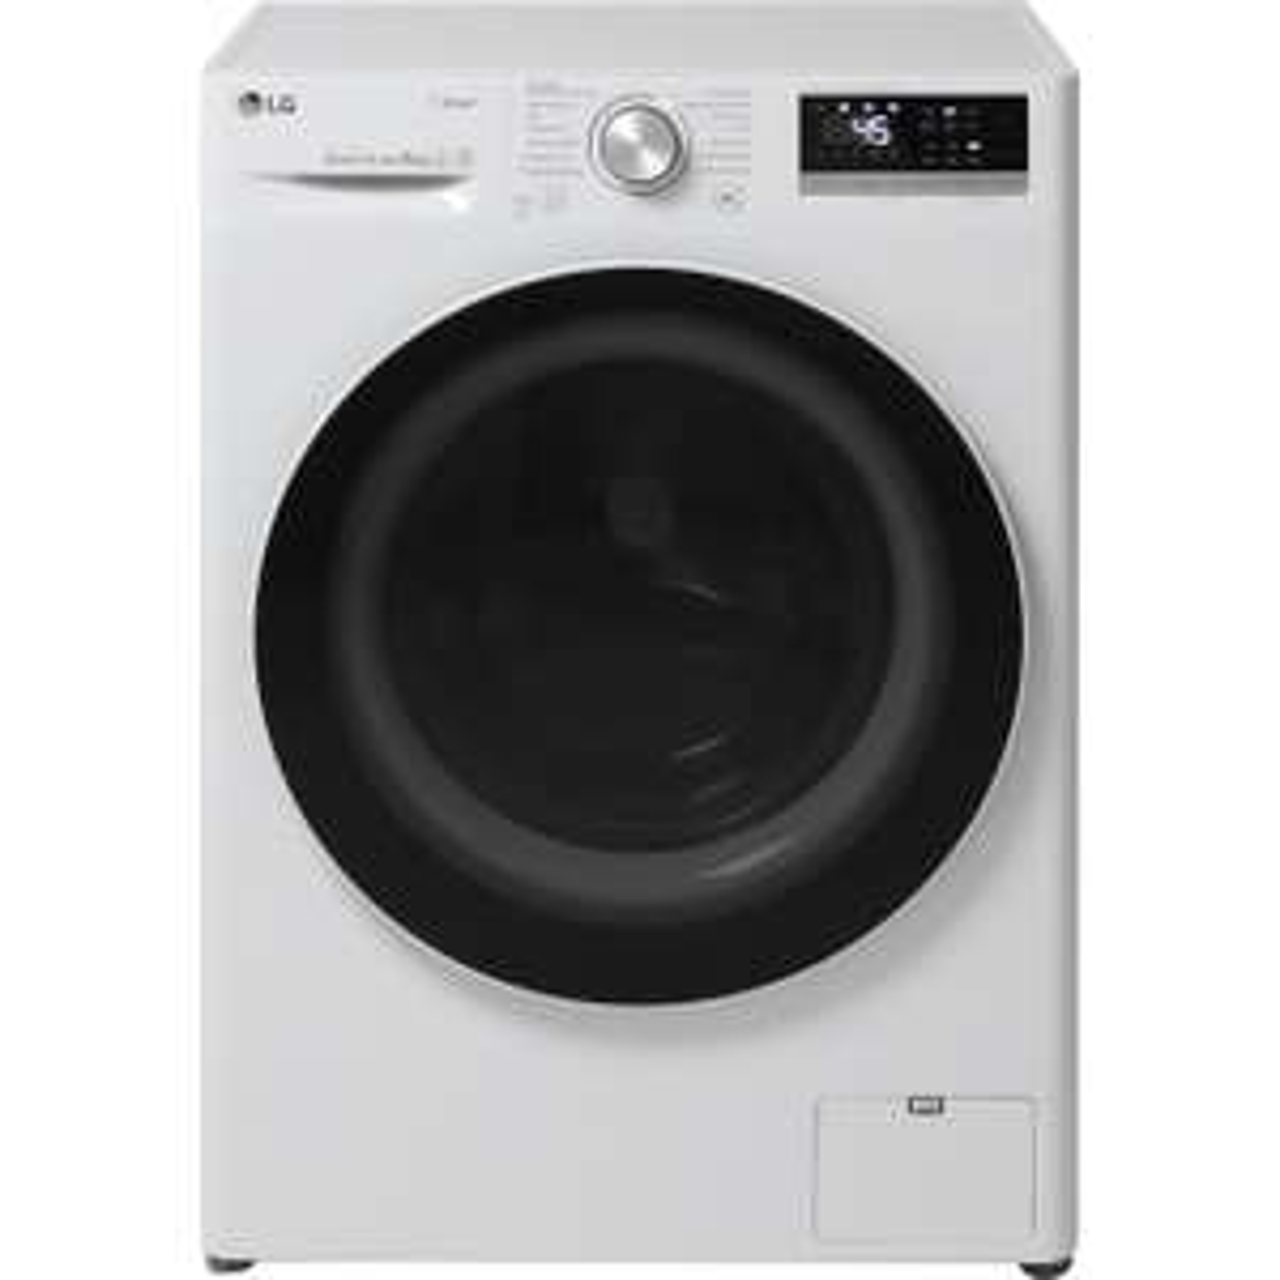 LG F4 WV 408S0 Waschmaschine, 8 kg, 1400 U/Min, A+++ mit WLAN / APP Touchscreen